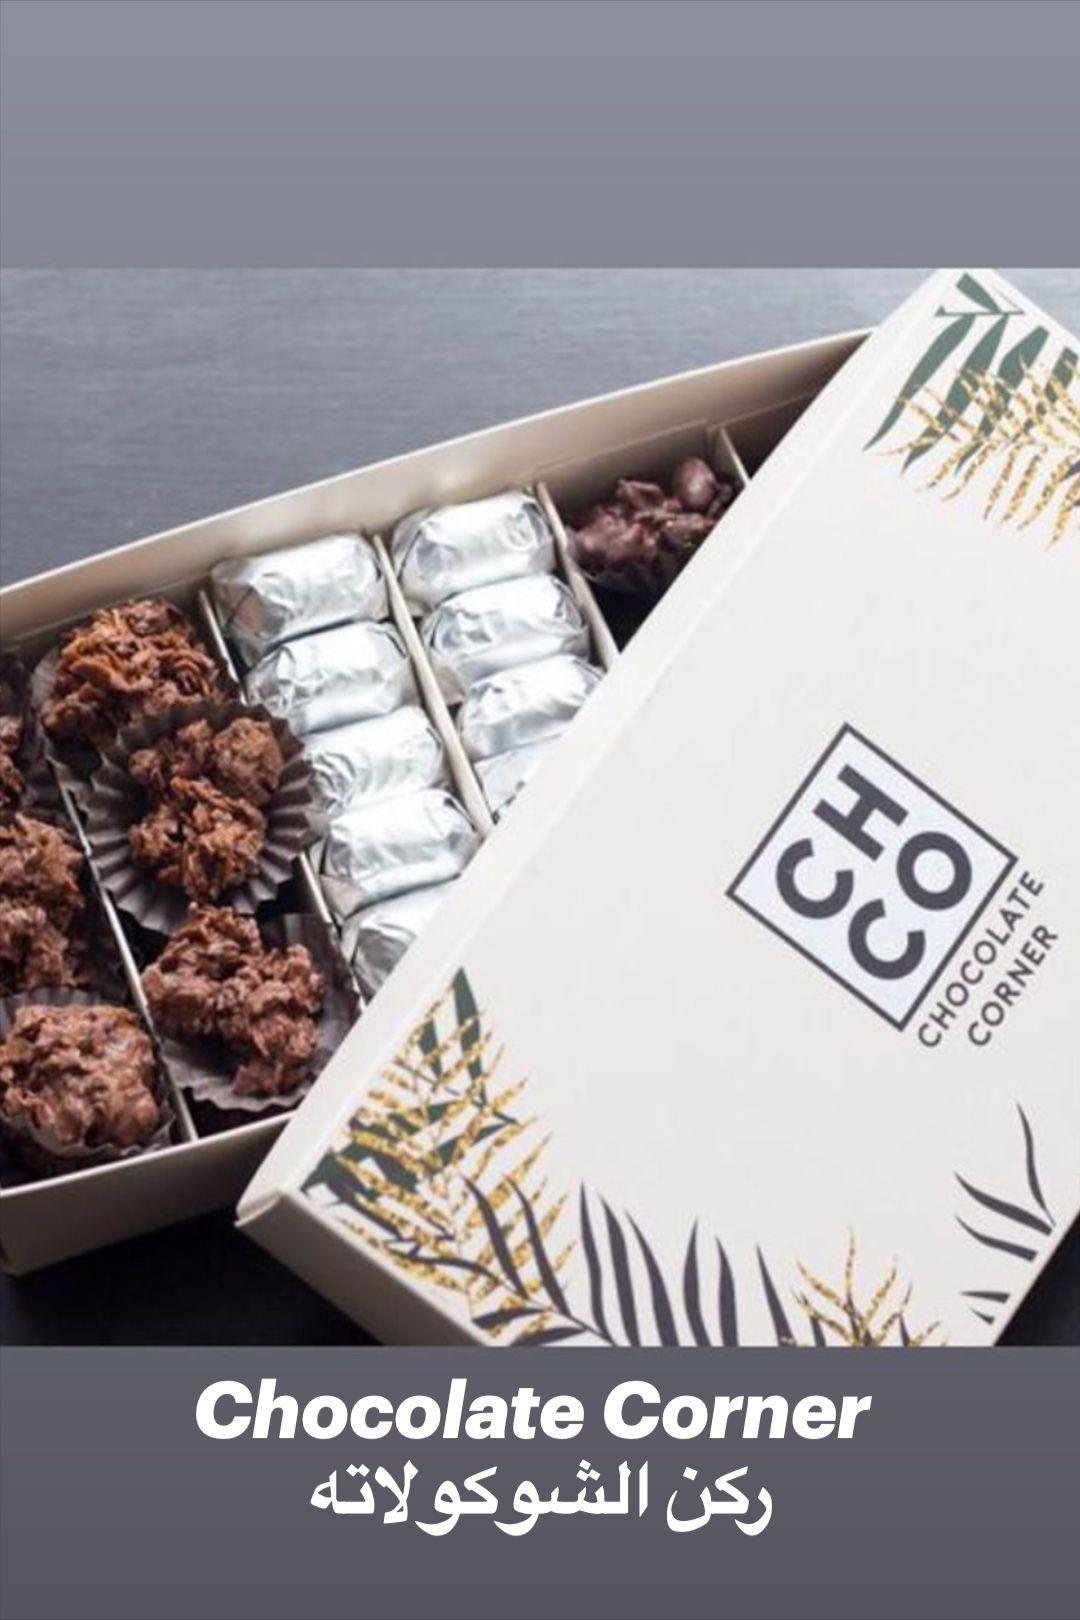 Chocolatecorner ركن الشوكولاته Findinksa Chocolate Chocolate Gifts Delicious Chocolate